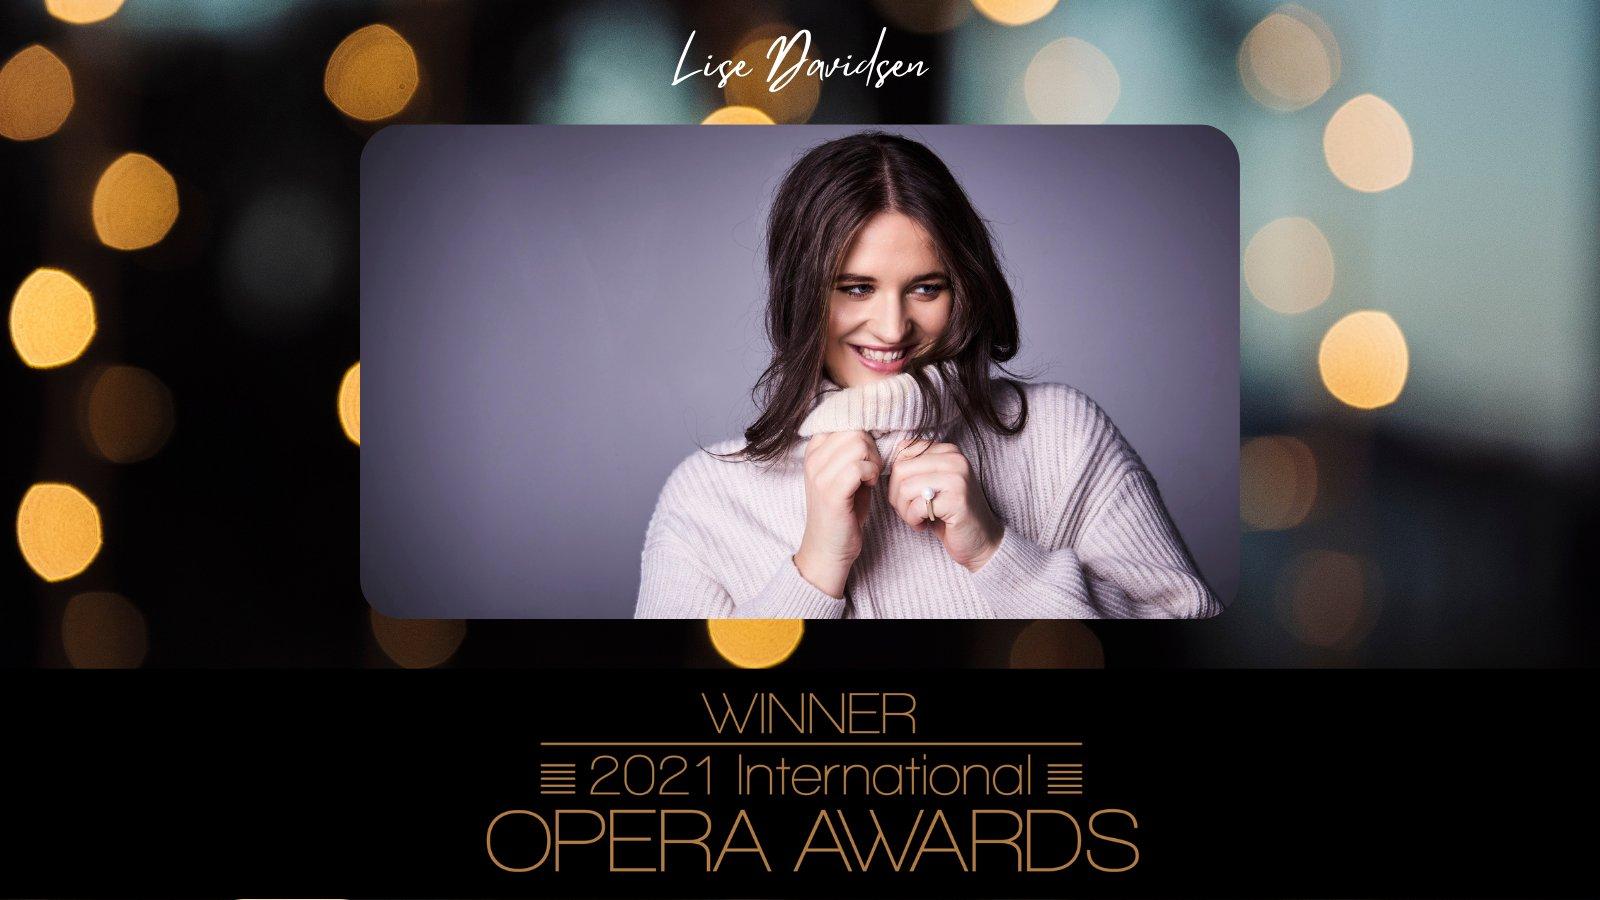 2021 International Opera Awards Female Singer of the Year!